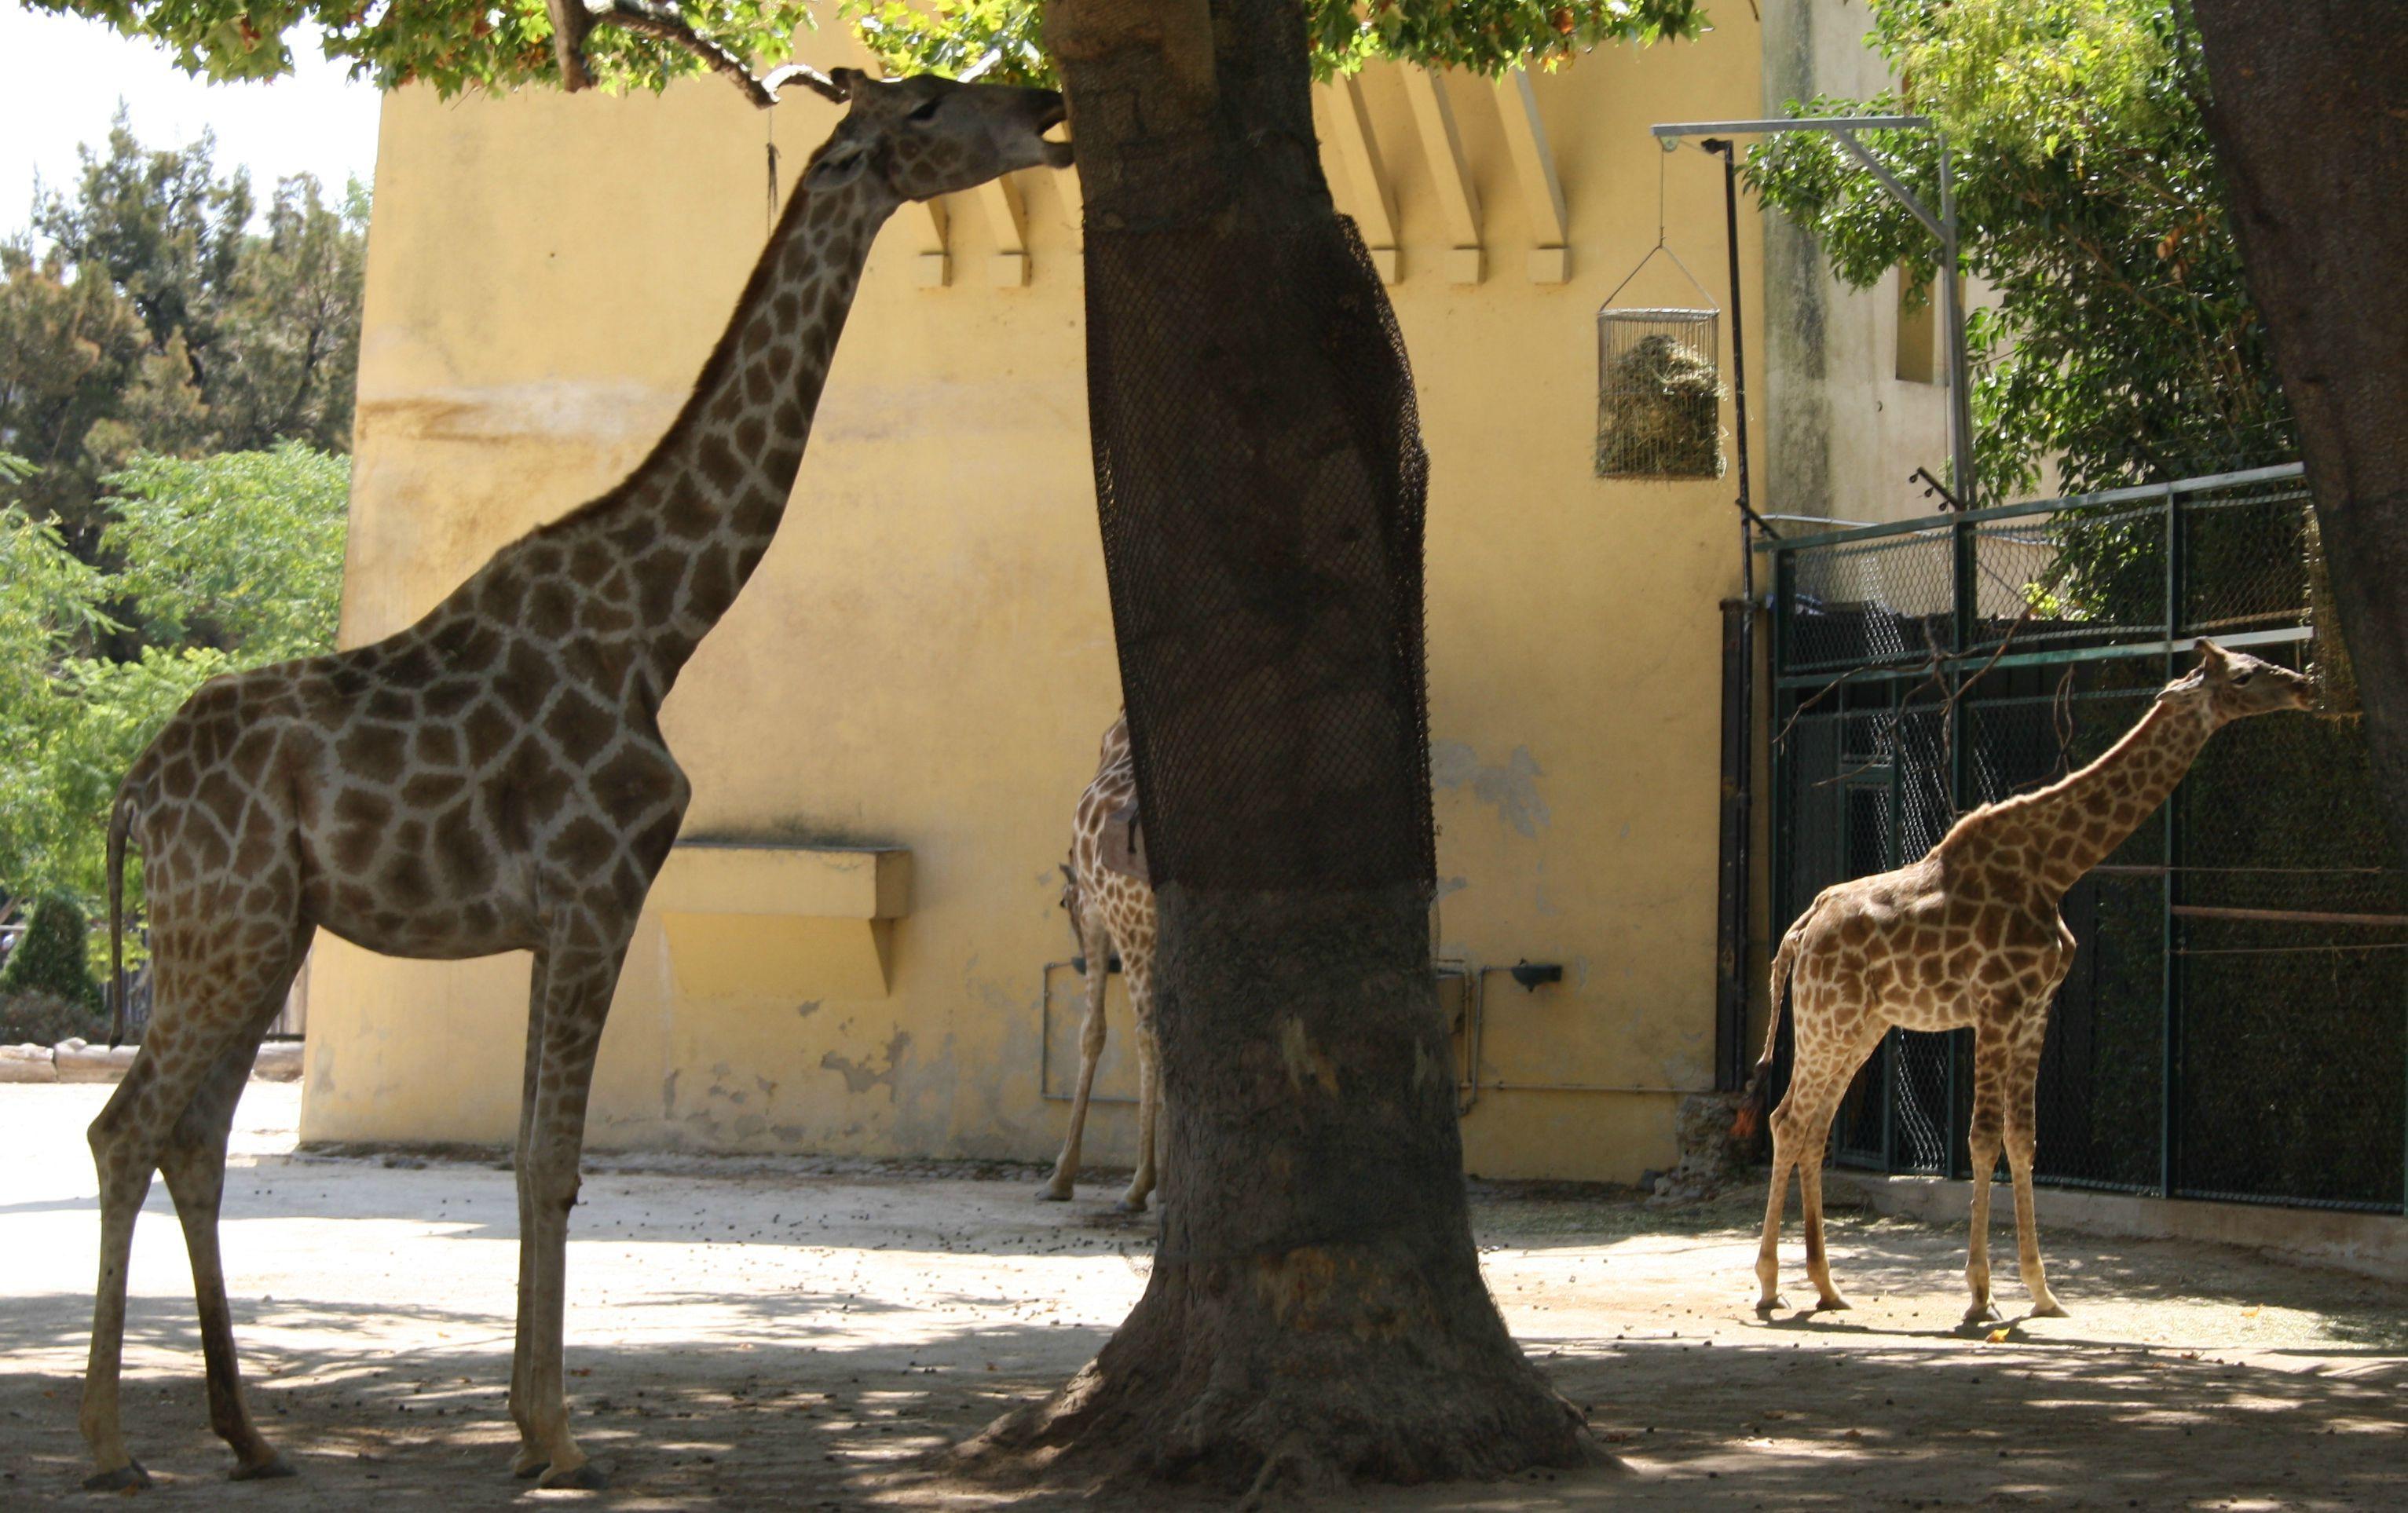 jardim zoologico 33.jpg